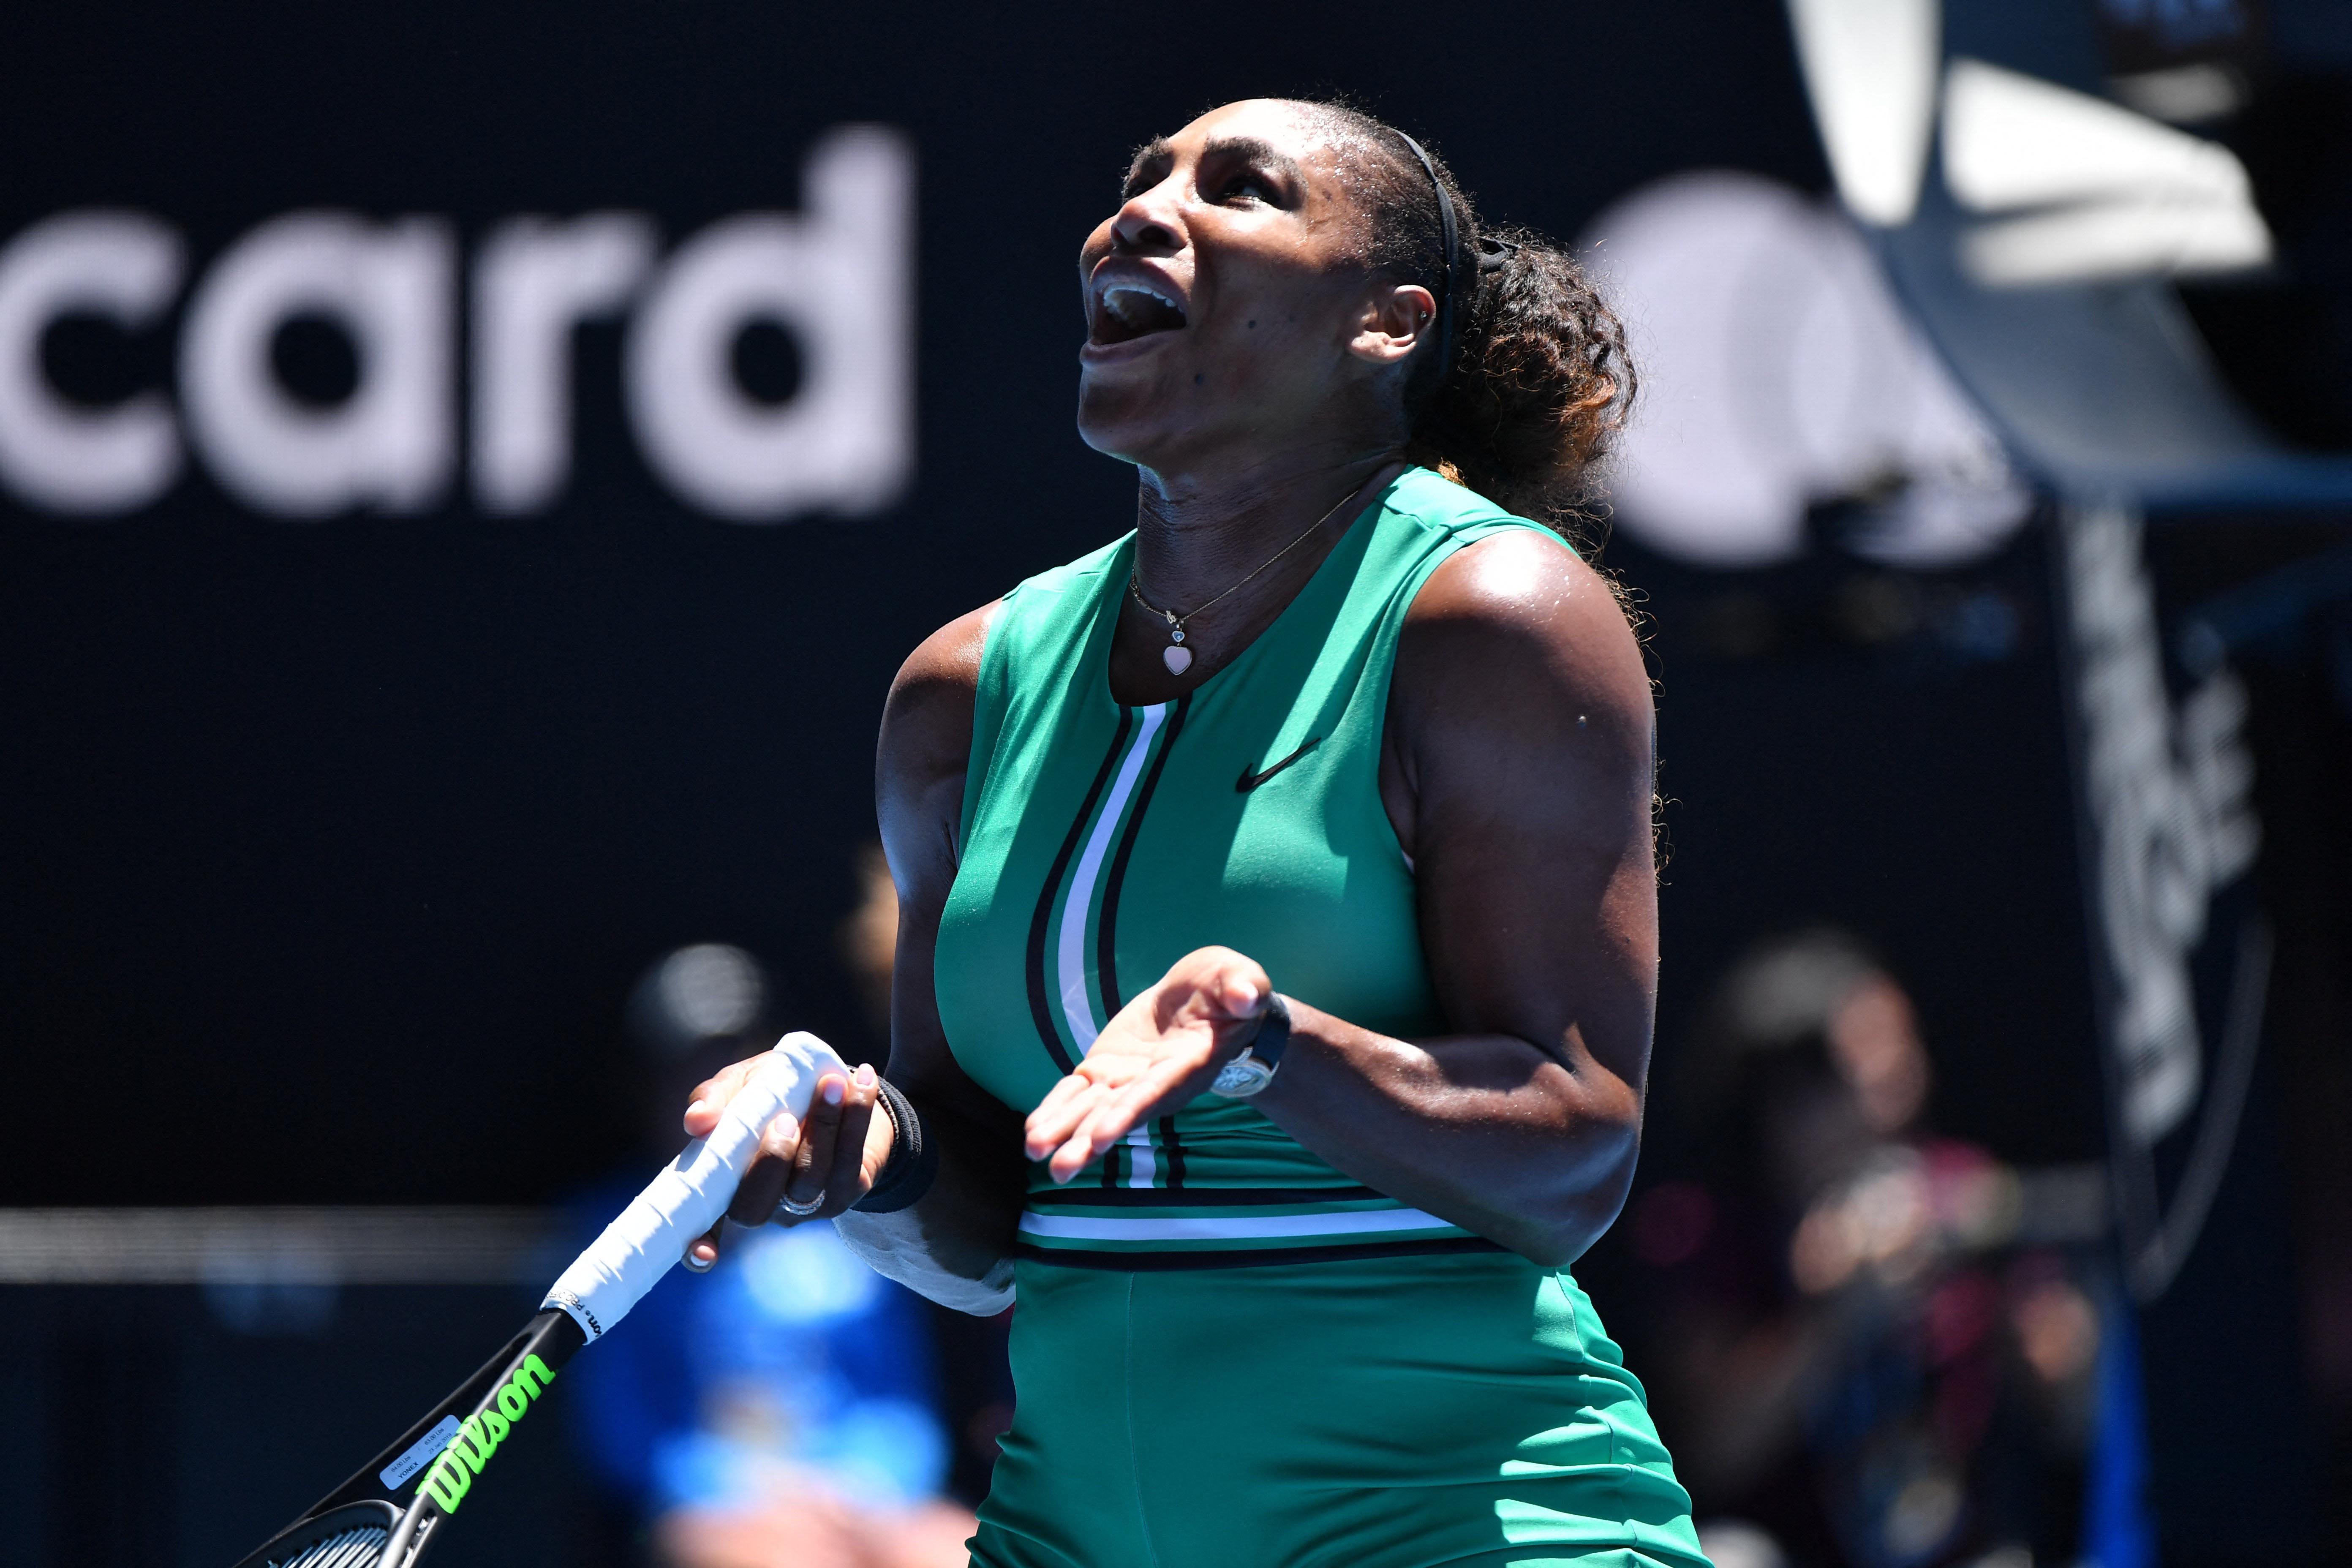 pictures Margaret Court 24 Grand Slam singles titles (11 in open-era)